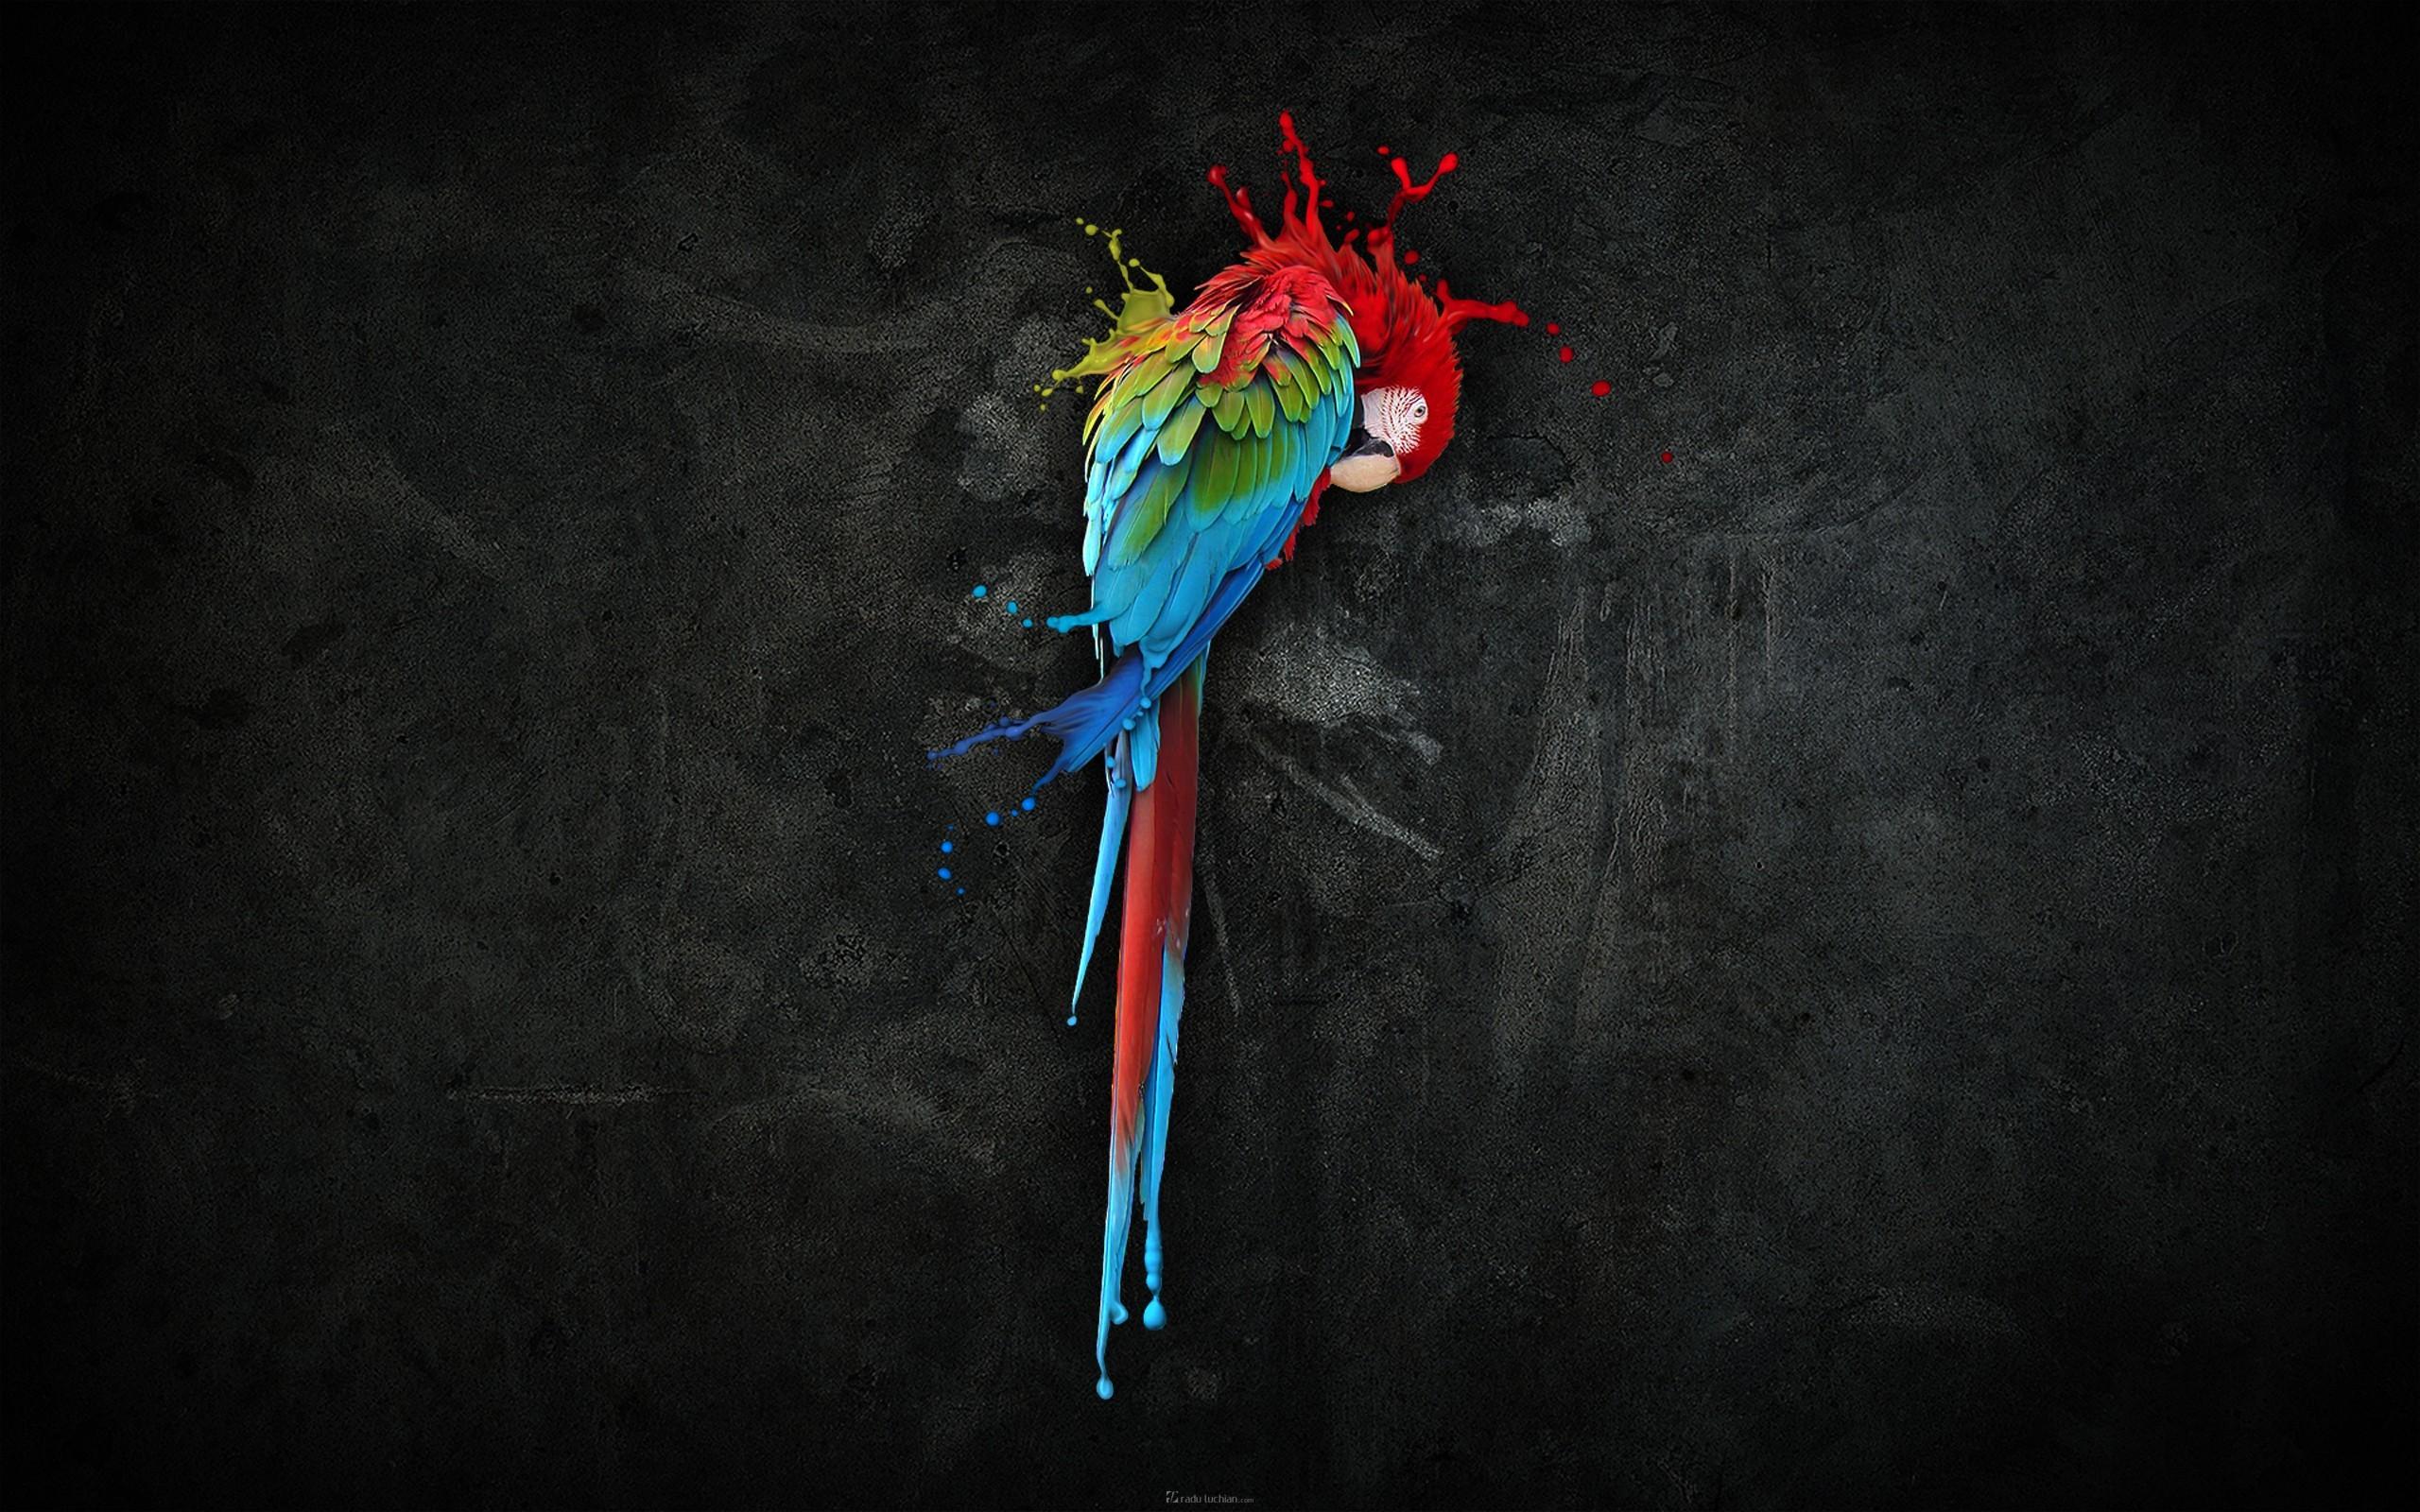 parrot hd 1080p desktop wallpaper 0007